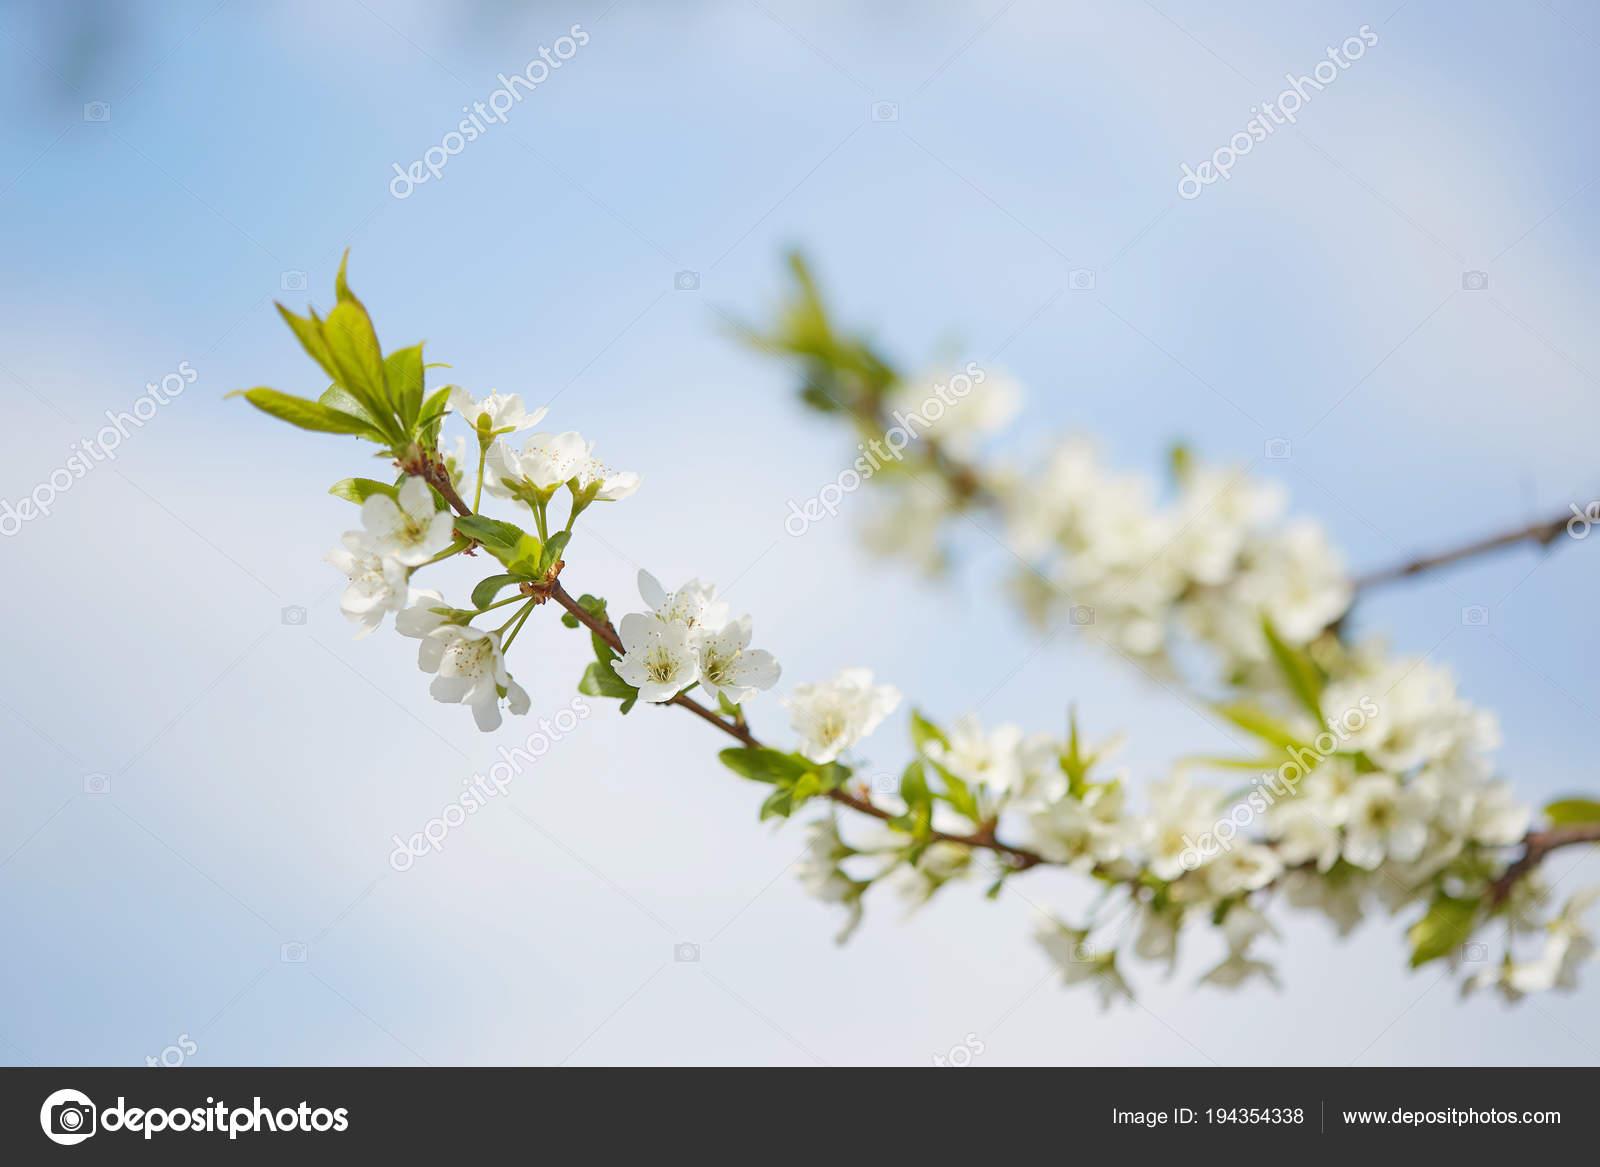 Fiori Bianchi Frutto.Primavera Ciliegia In Fiori Bianchi Fioritura Di Alberi Da